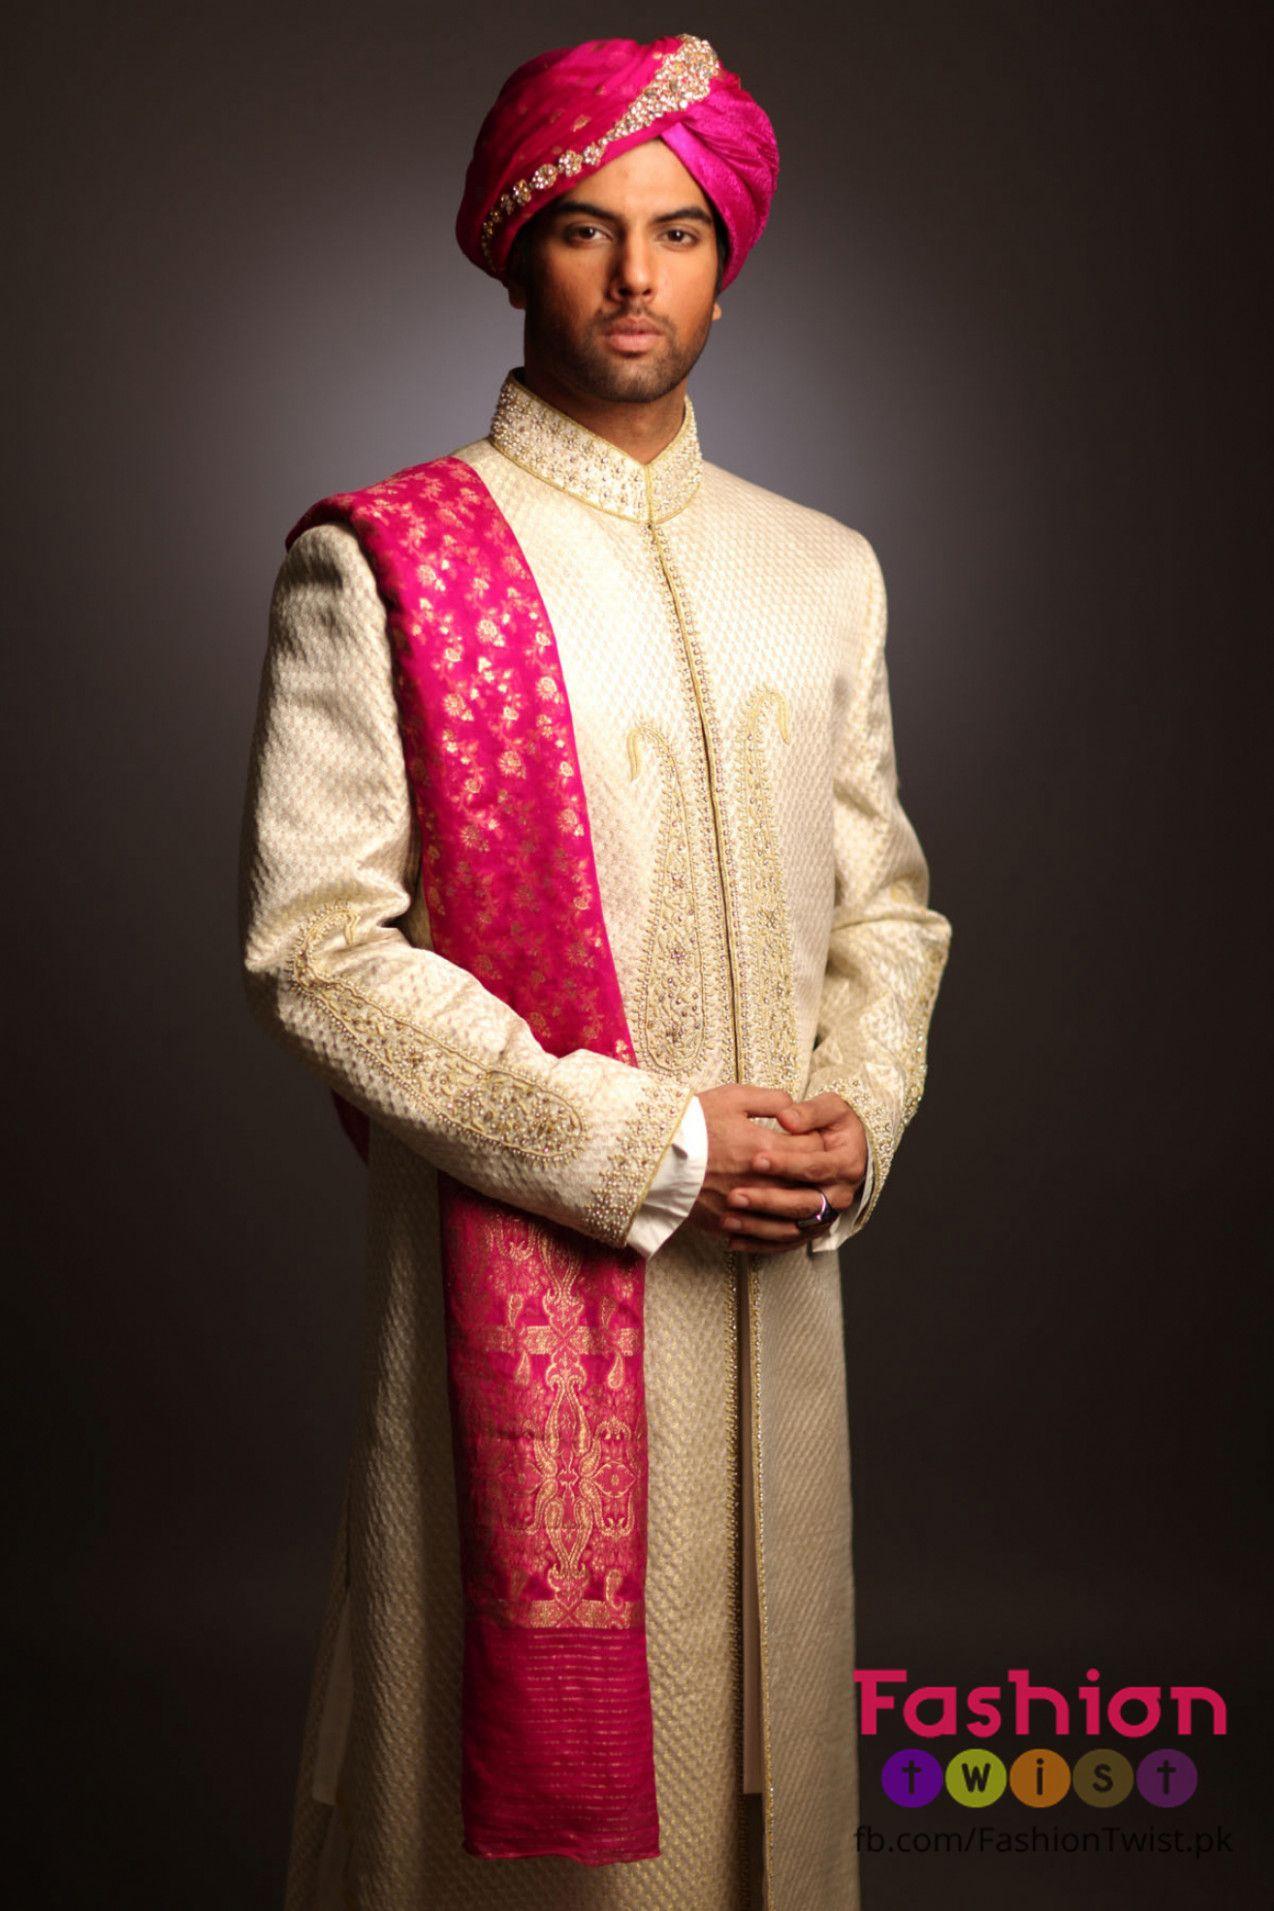 Indian Wedding Groom Men Wear (With images) Indian groom